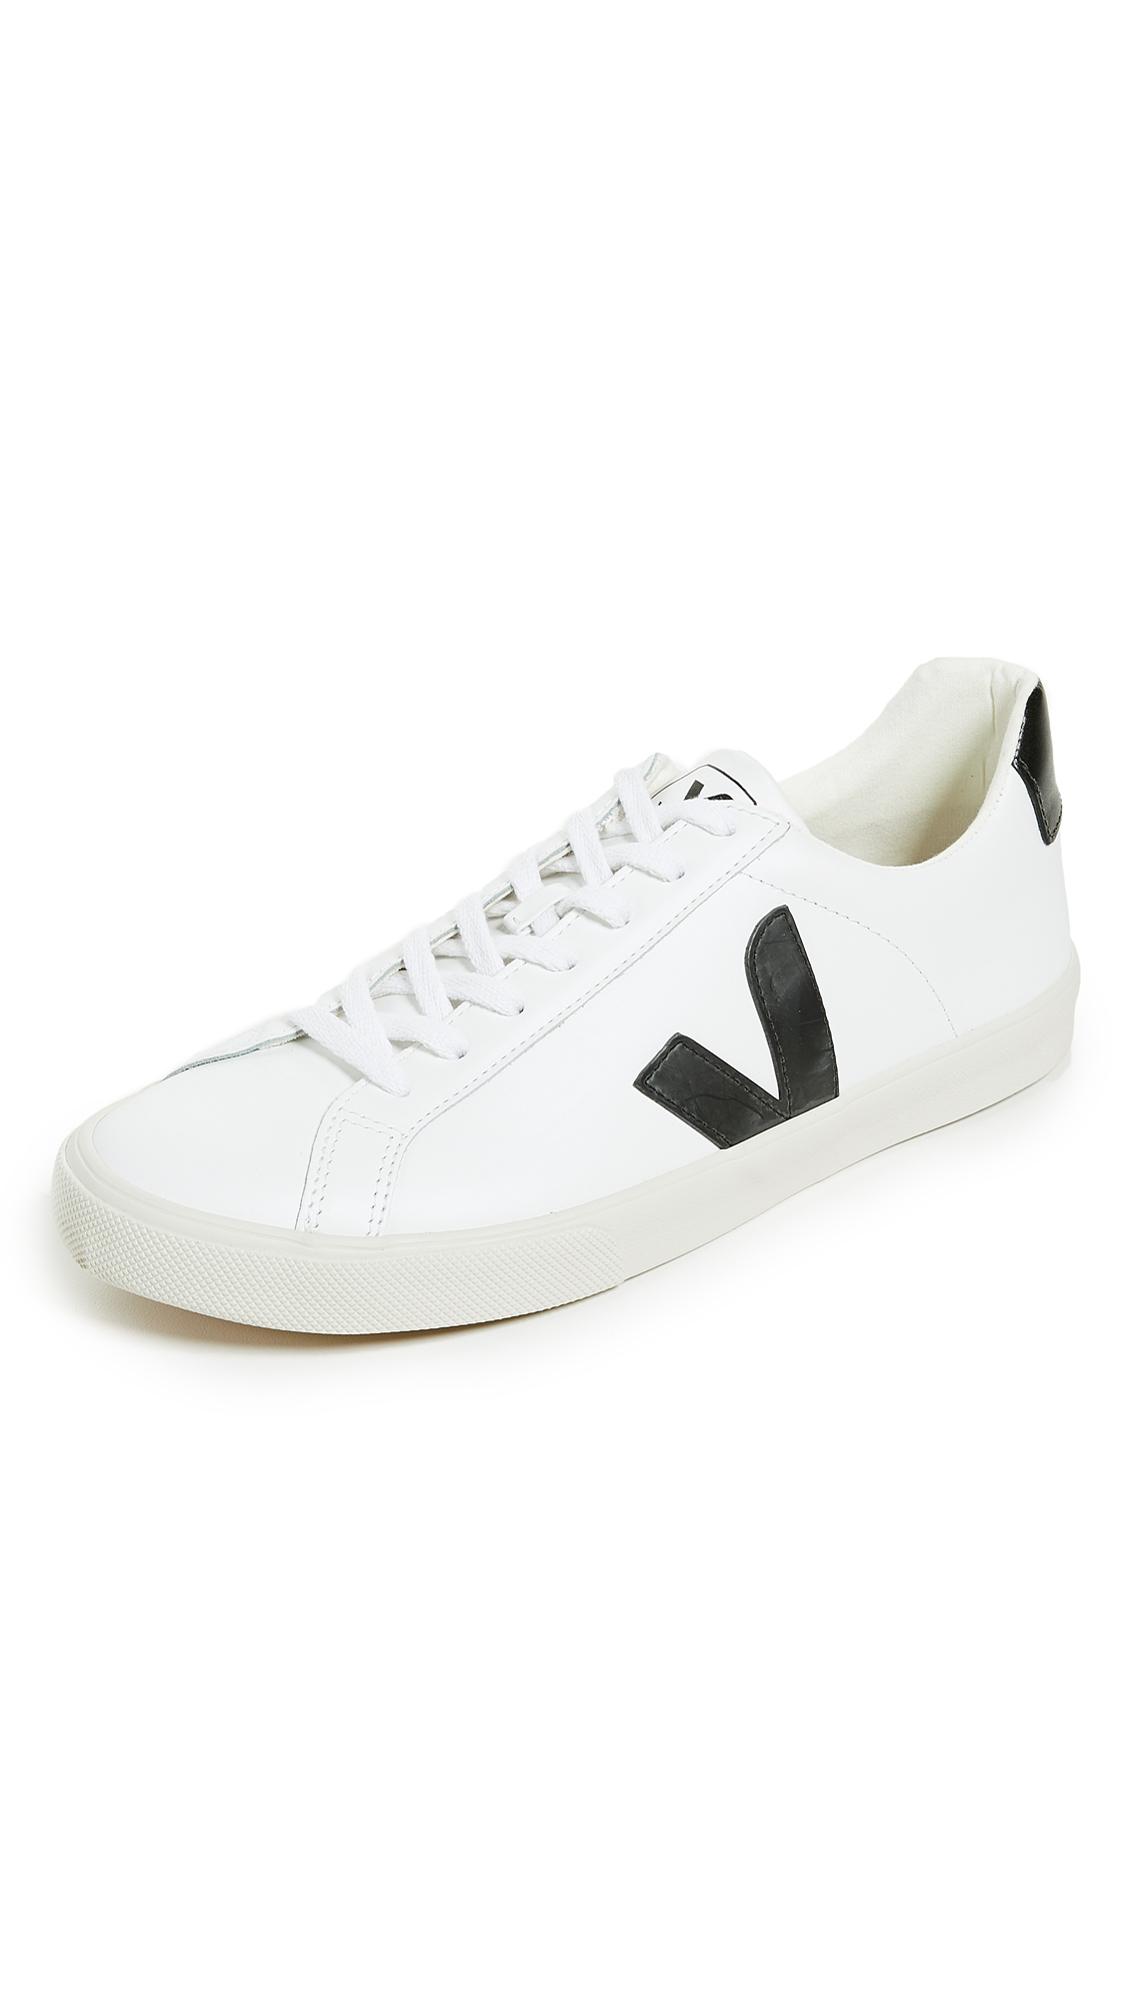 83166eae164aa Veja Esplar Leather Sneakers   EAST DANE